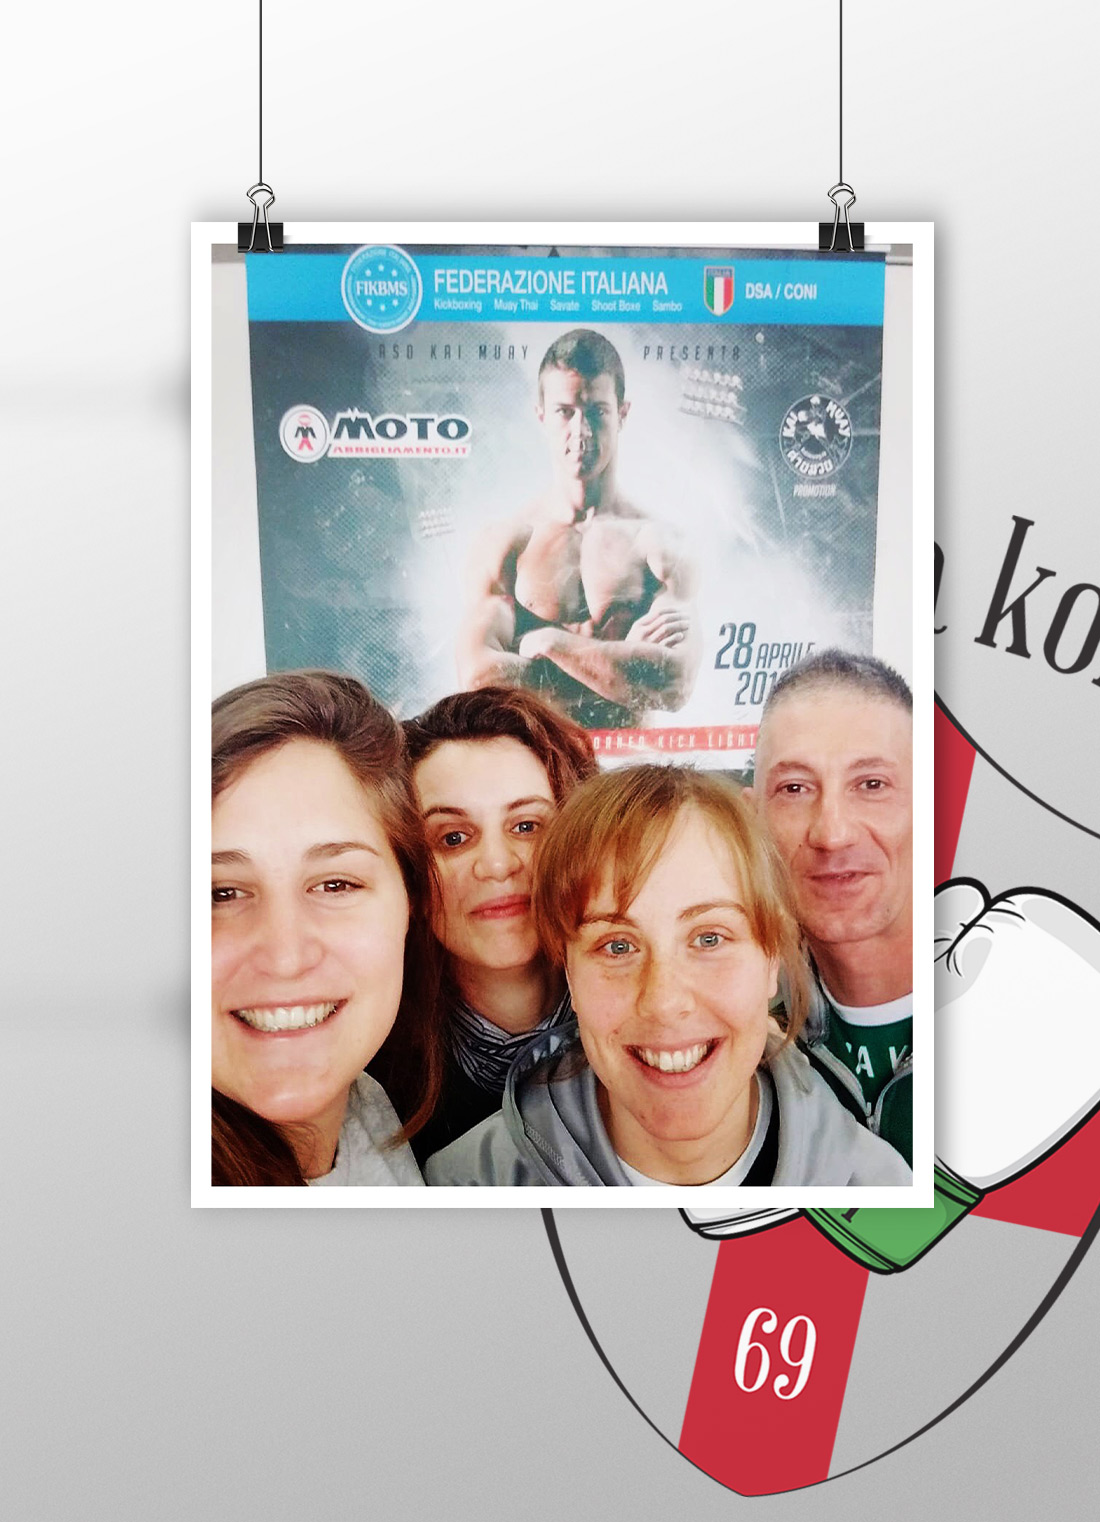 mal-di-testa-28aprile2019-ladamakombat-genova-kickboxing